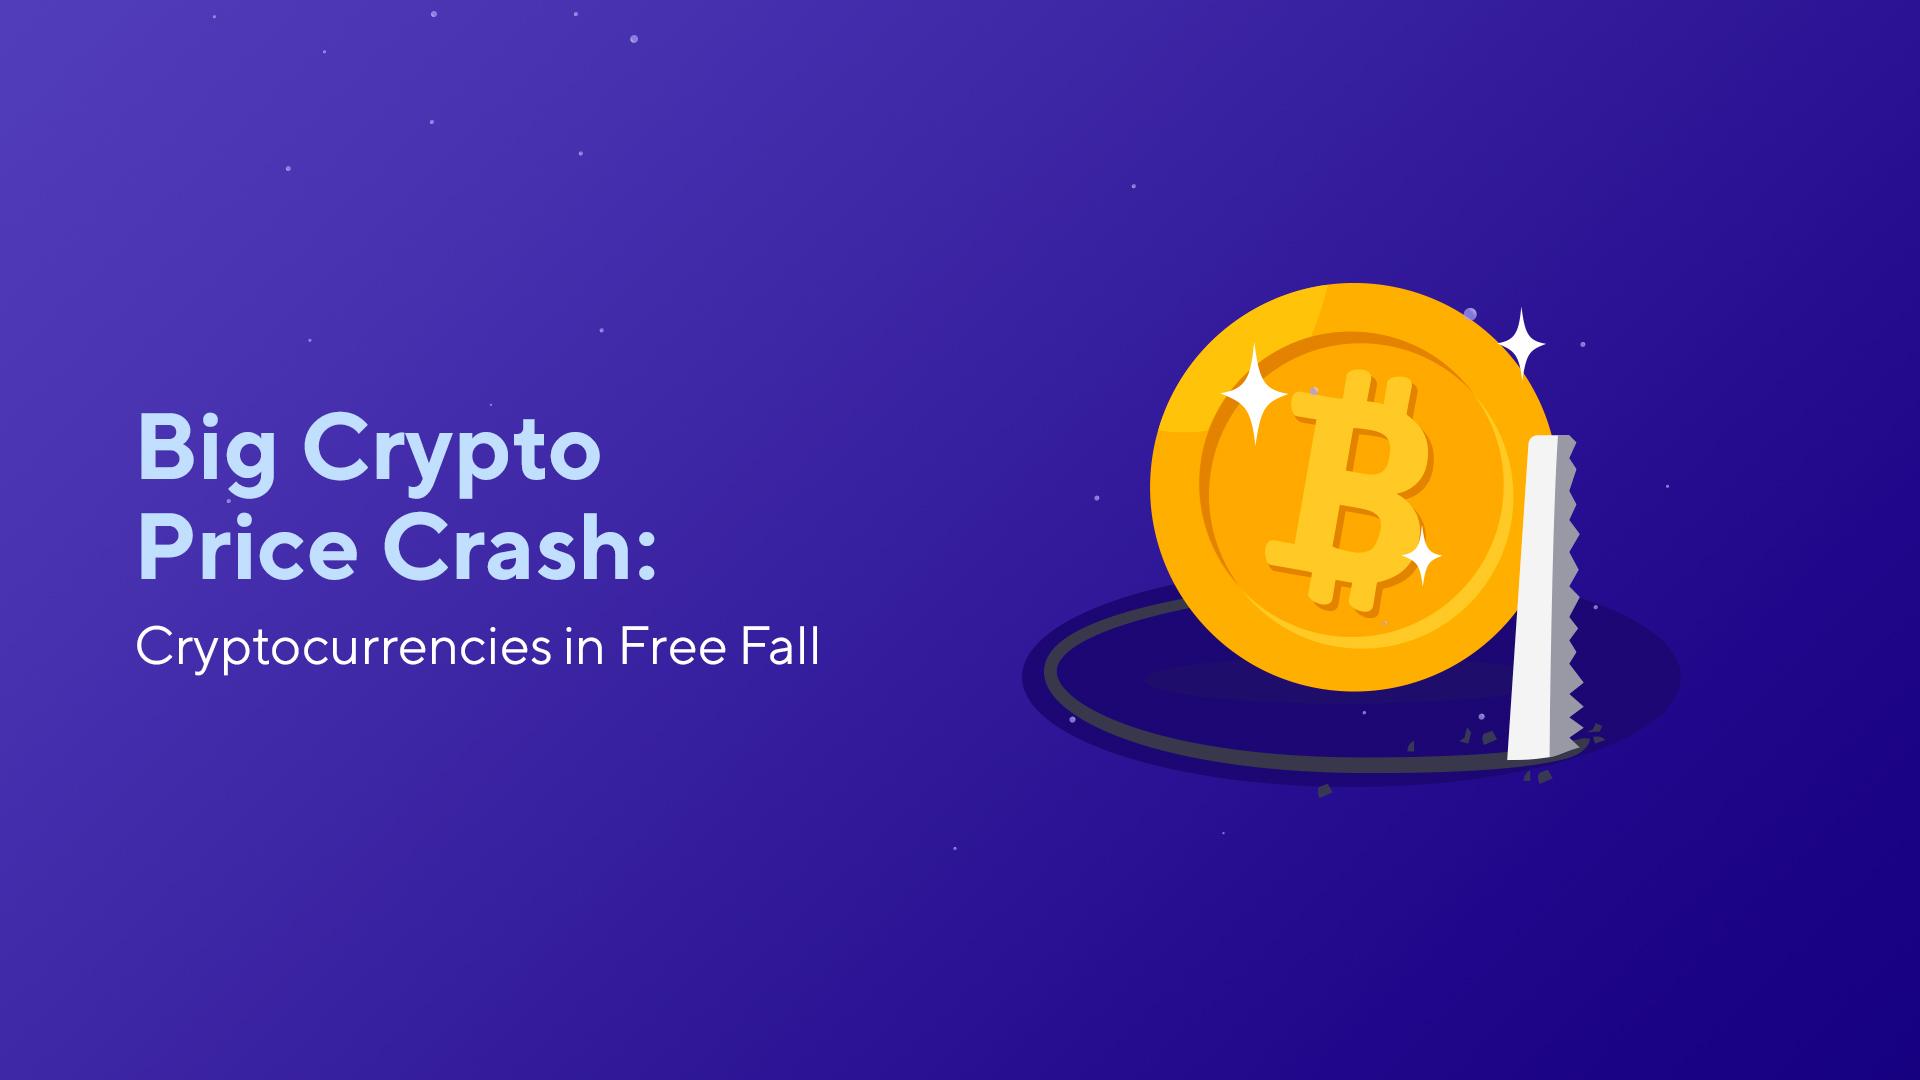 Big Crypto Price Crash: Cryptocurrencies in Free Fall